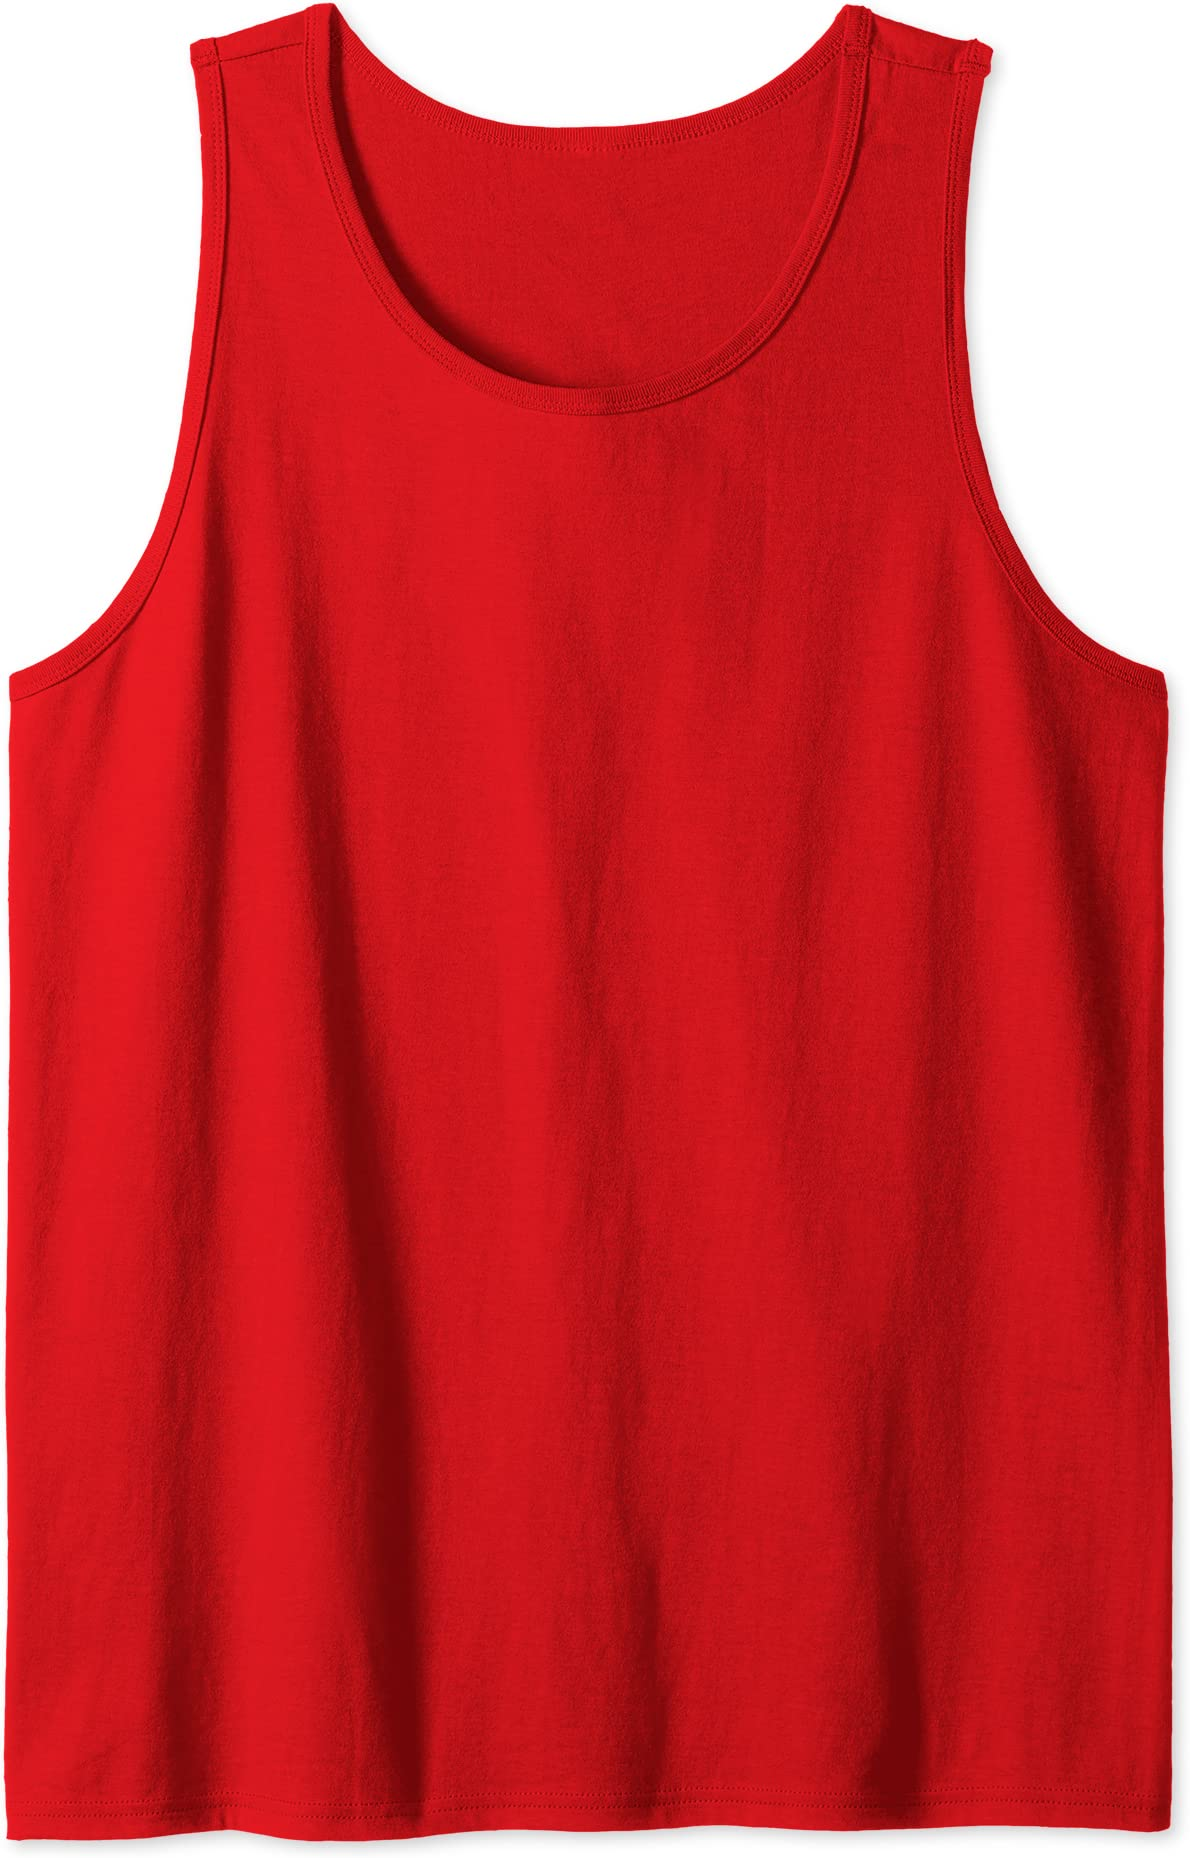 Funny Novelty Vest Singlet Top Cccp Red